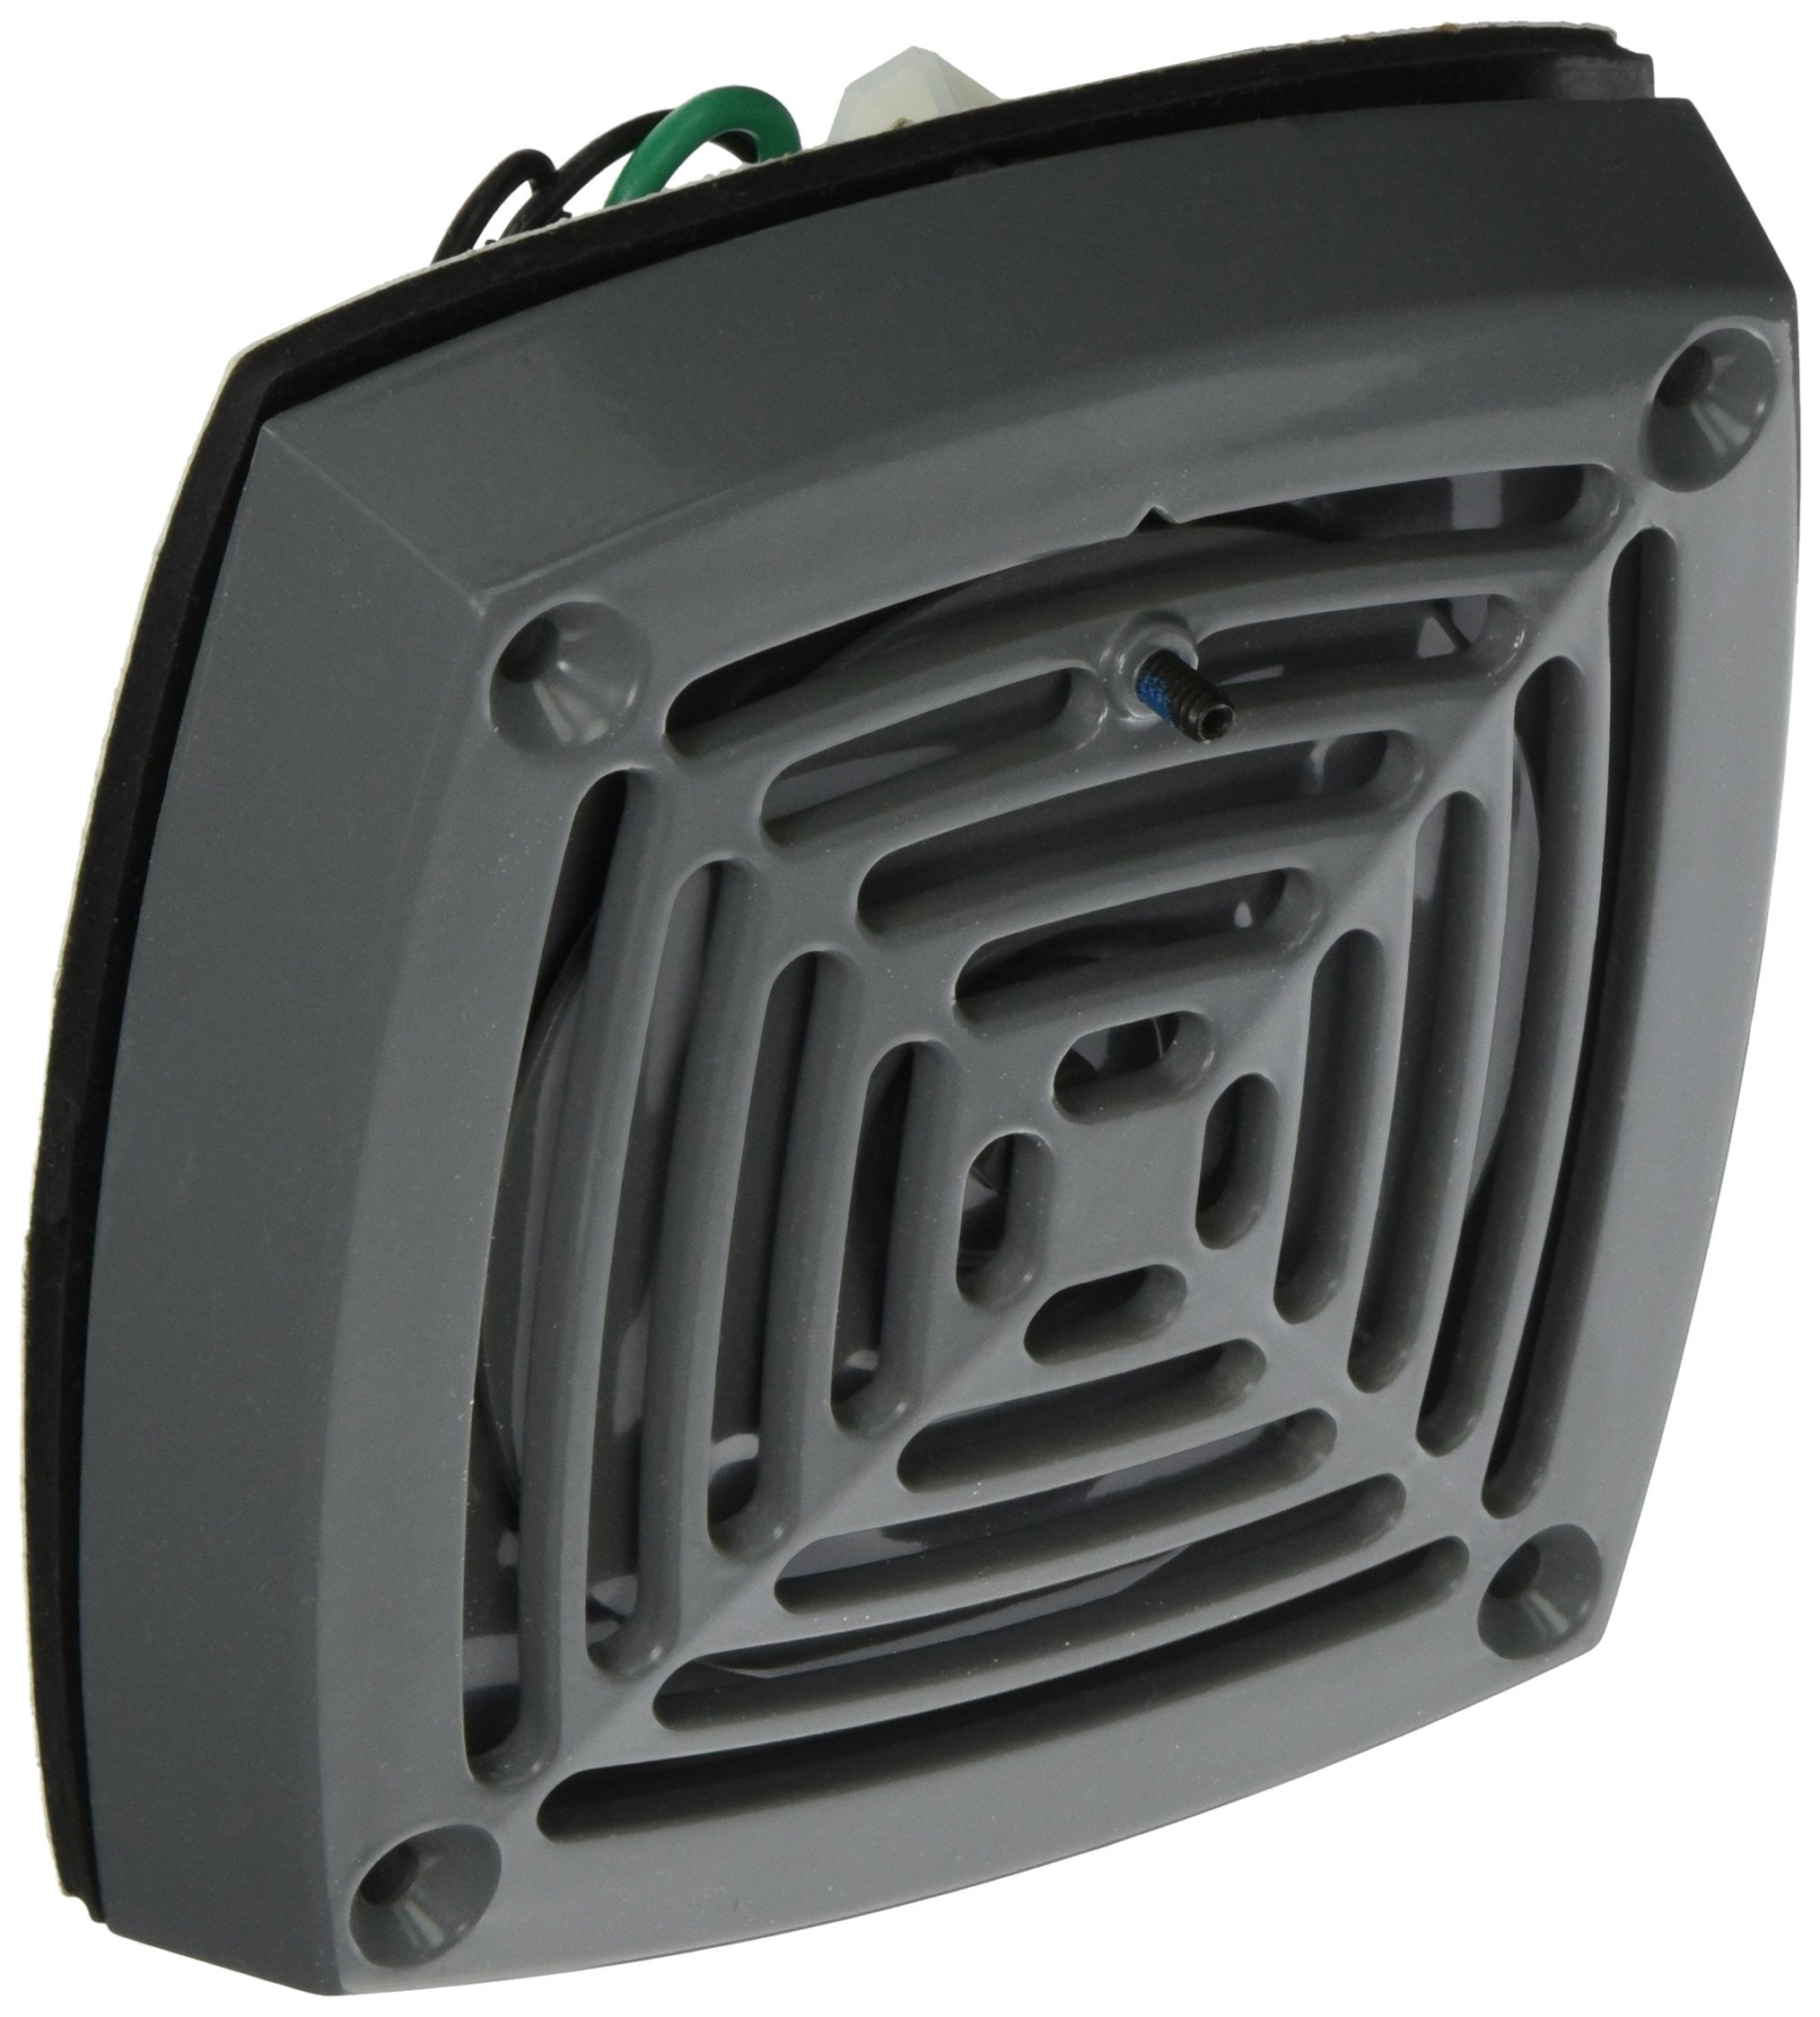 Edwards Signaling 870P-N5 Vibrating Horn, Heavy Duty, 113/103 db, Panel Mount, Volume Adjustable, 120V AC, Gray by Edwards-Signaling